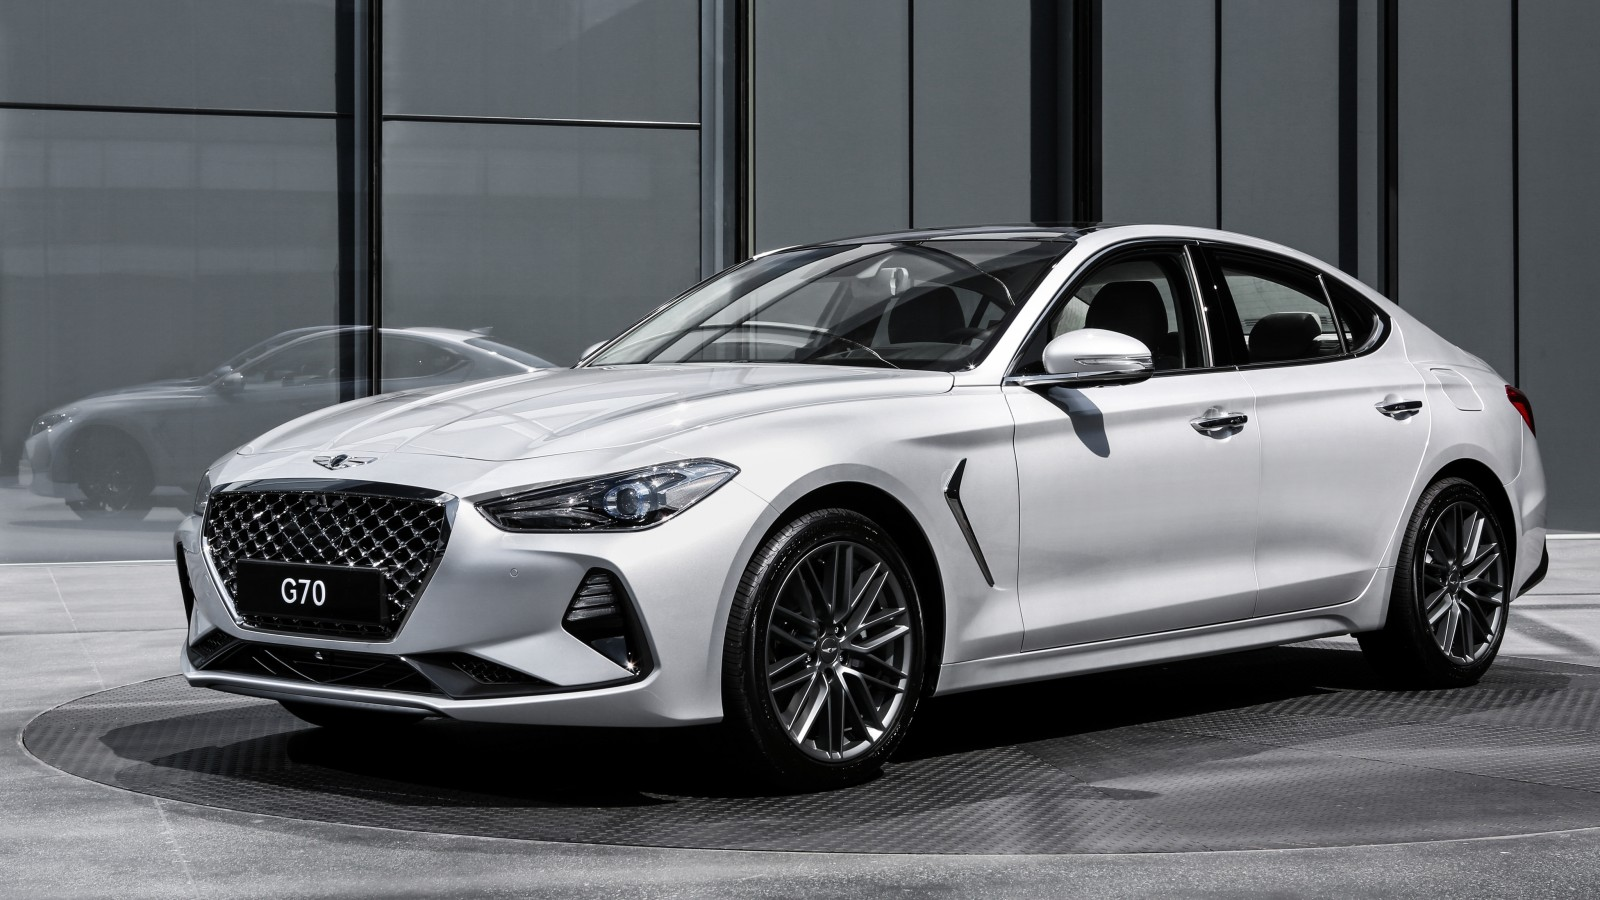 Bmw White Cars Wallpapers 2018 Genesis G70 4k Wallpaper Hd Car Wallpapers Id 8661